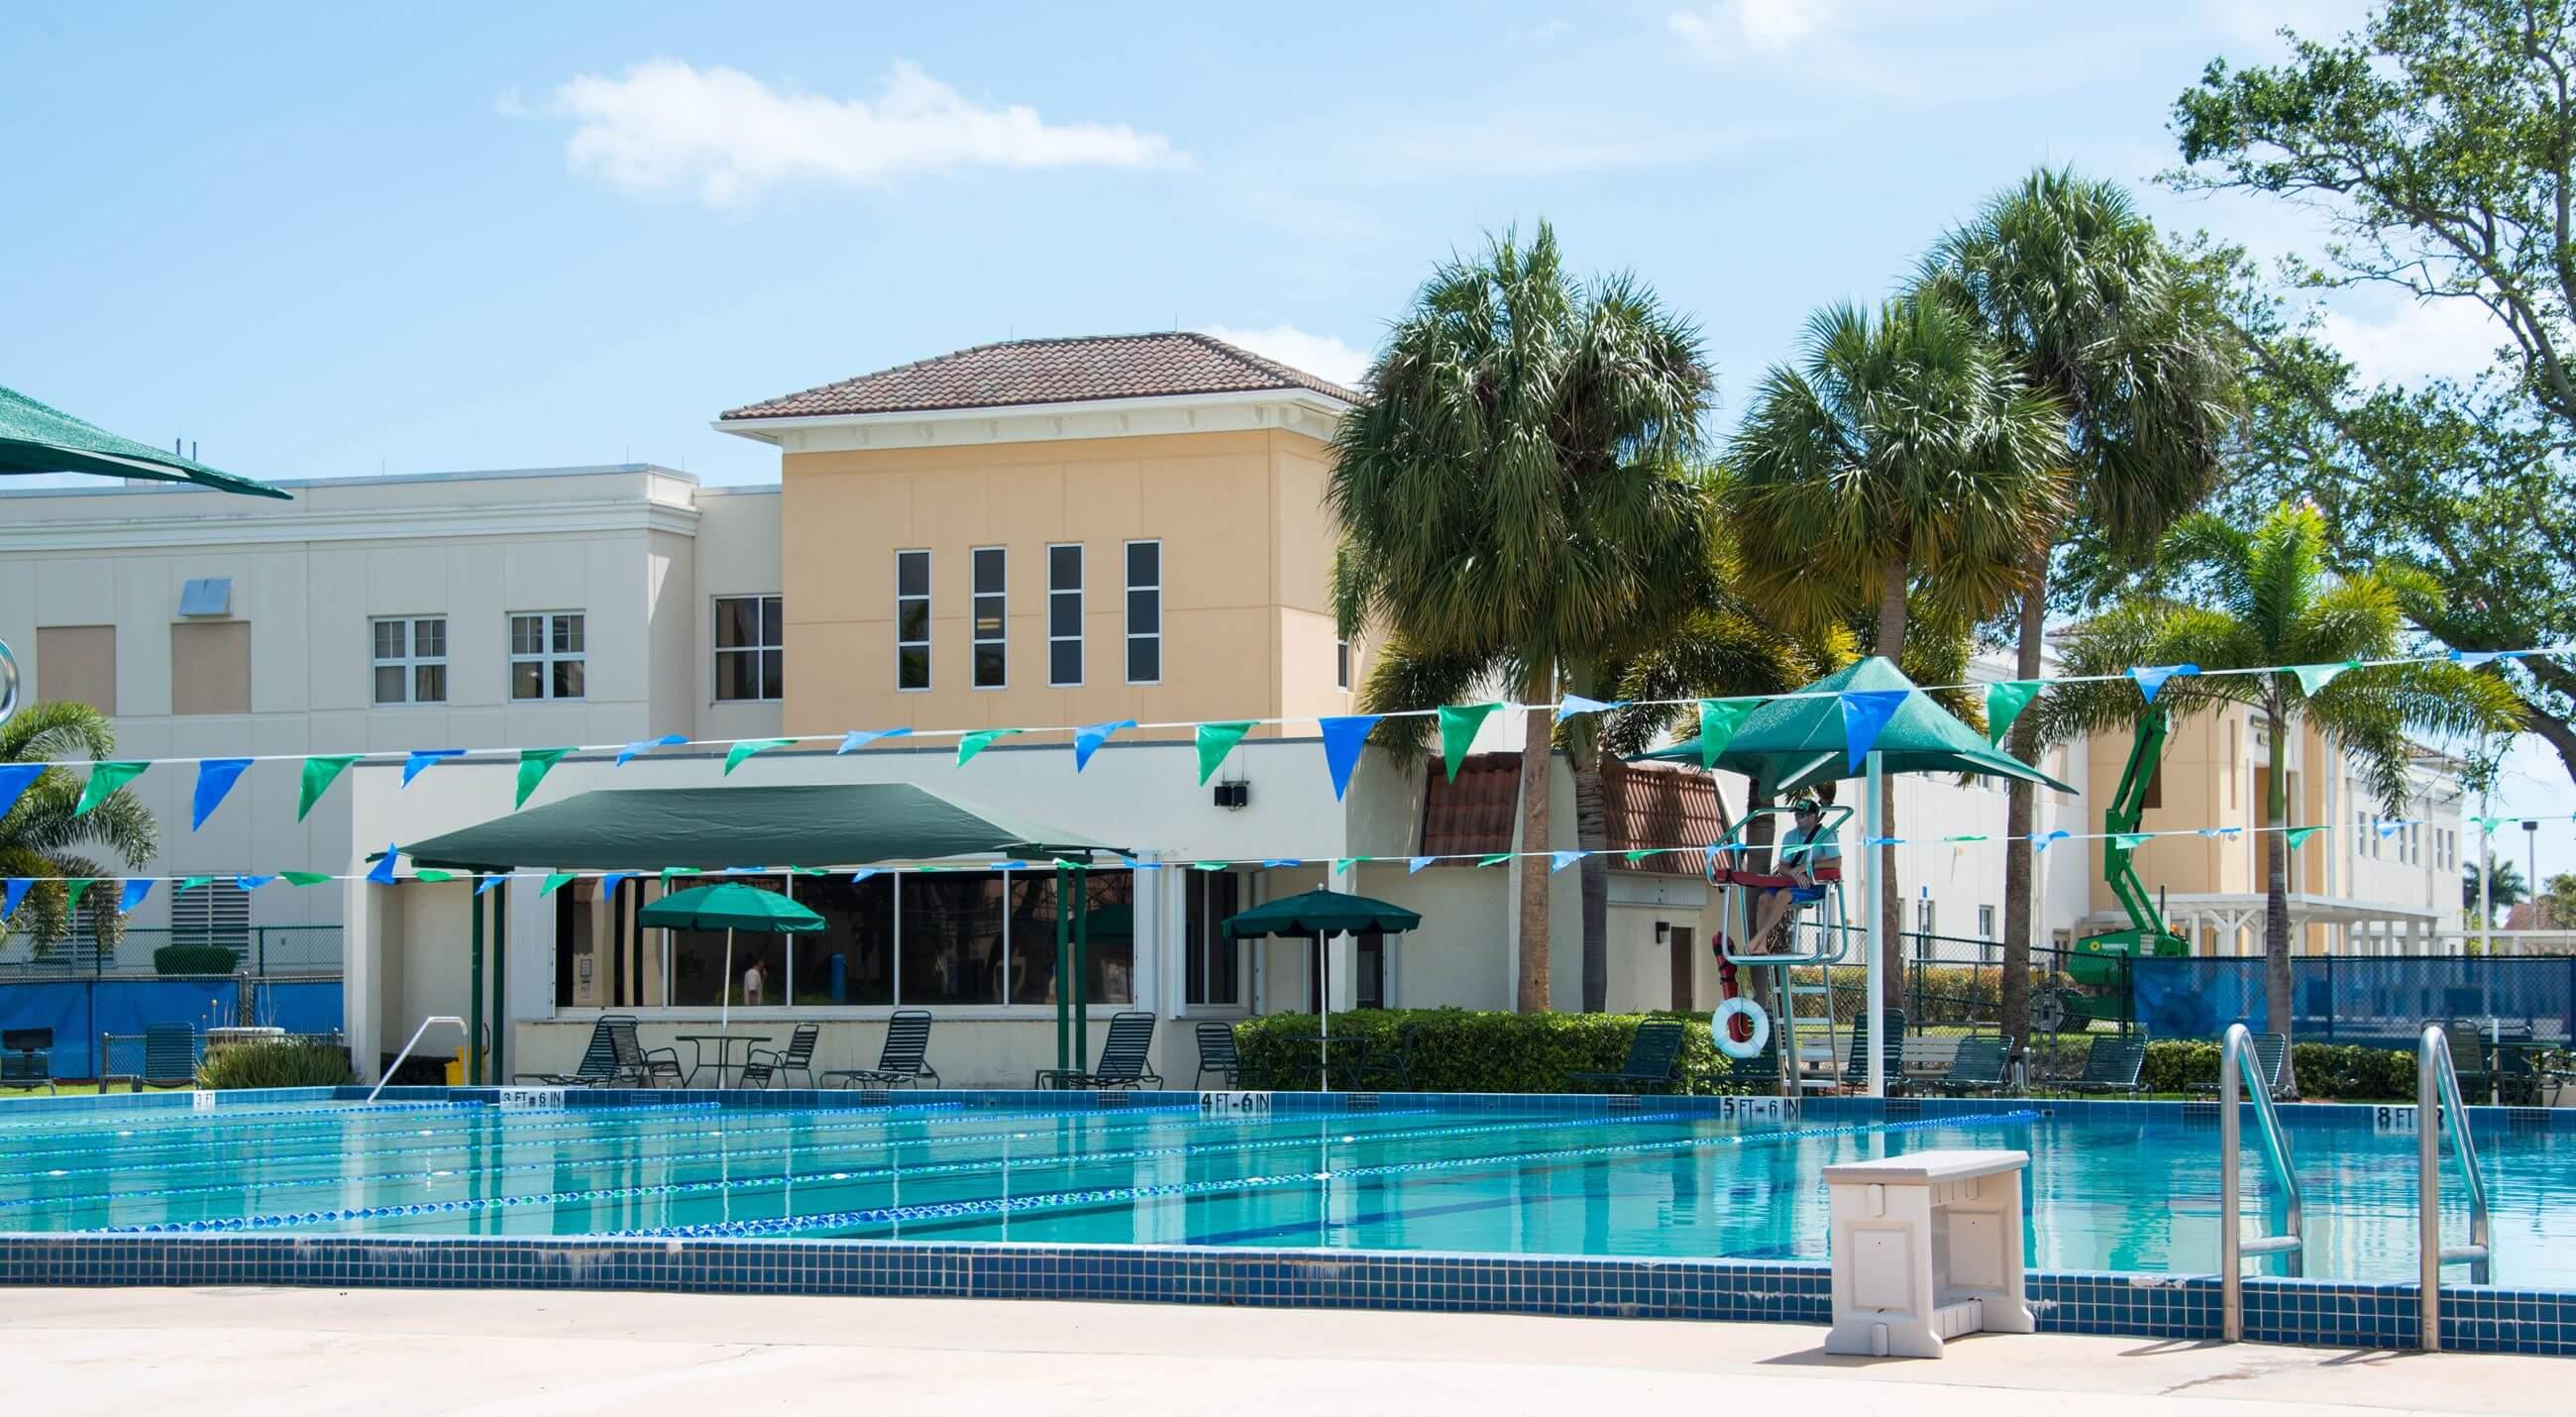 Meadows Park Public Pool Boca Raton